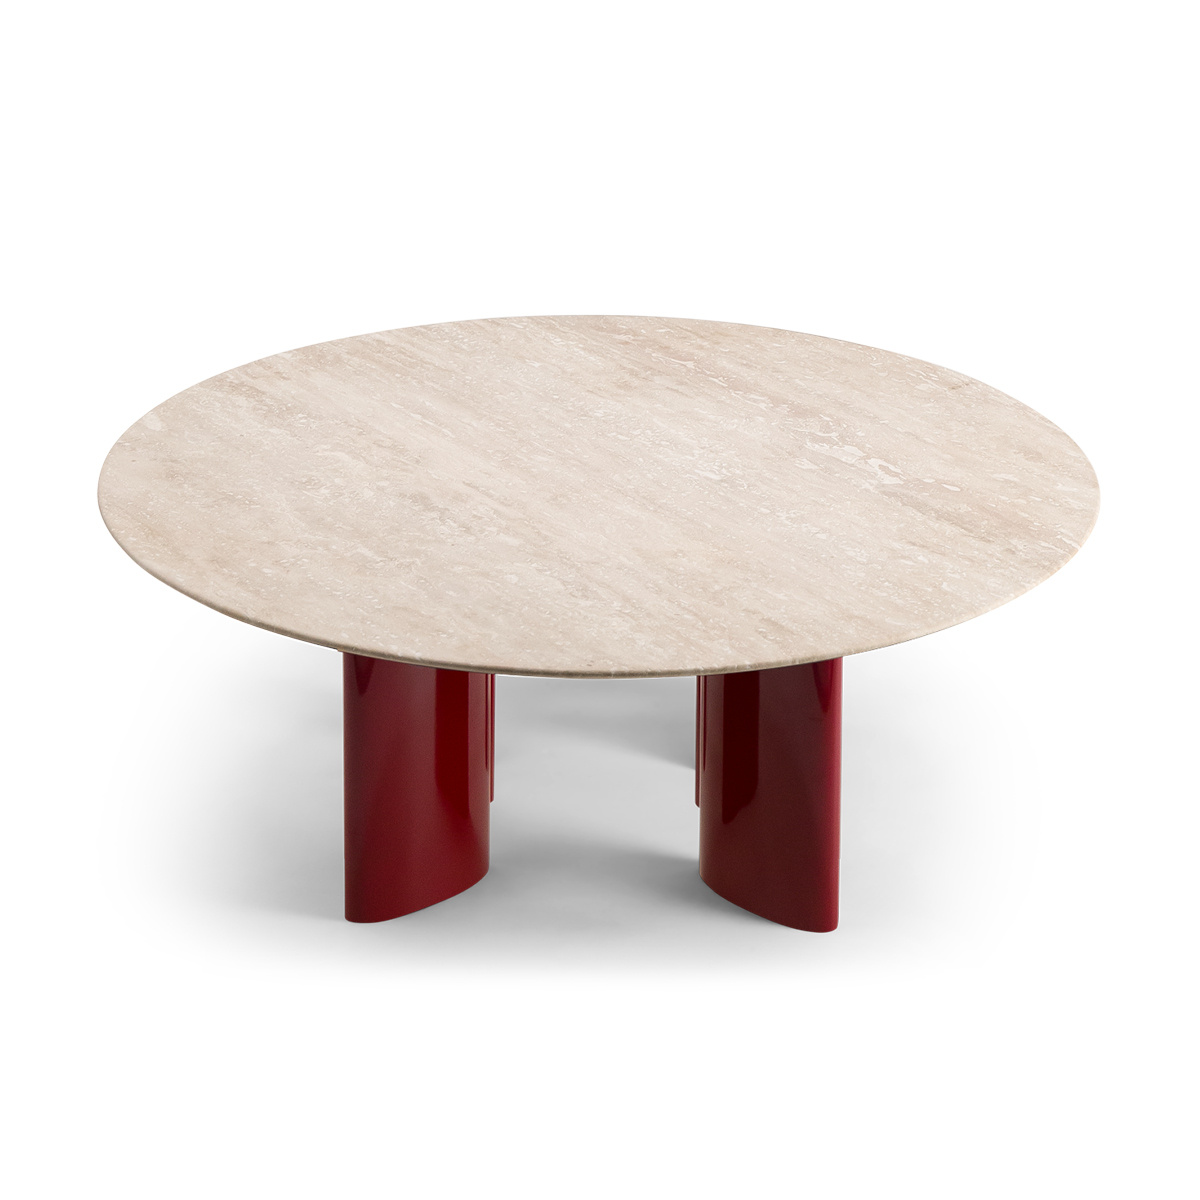 Table basse Carlotta pieds laques rouge et travertin